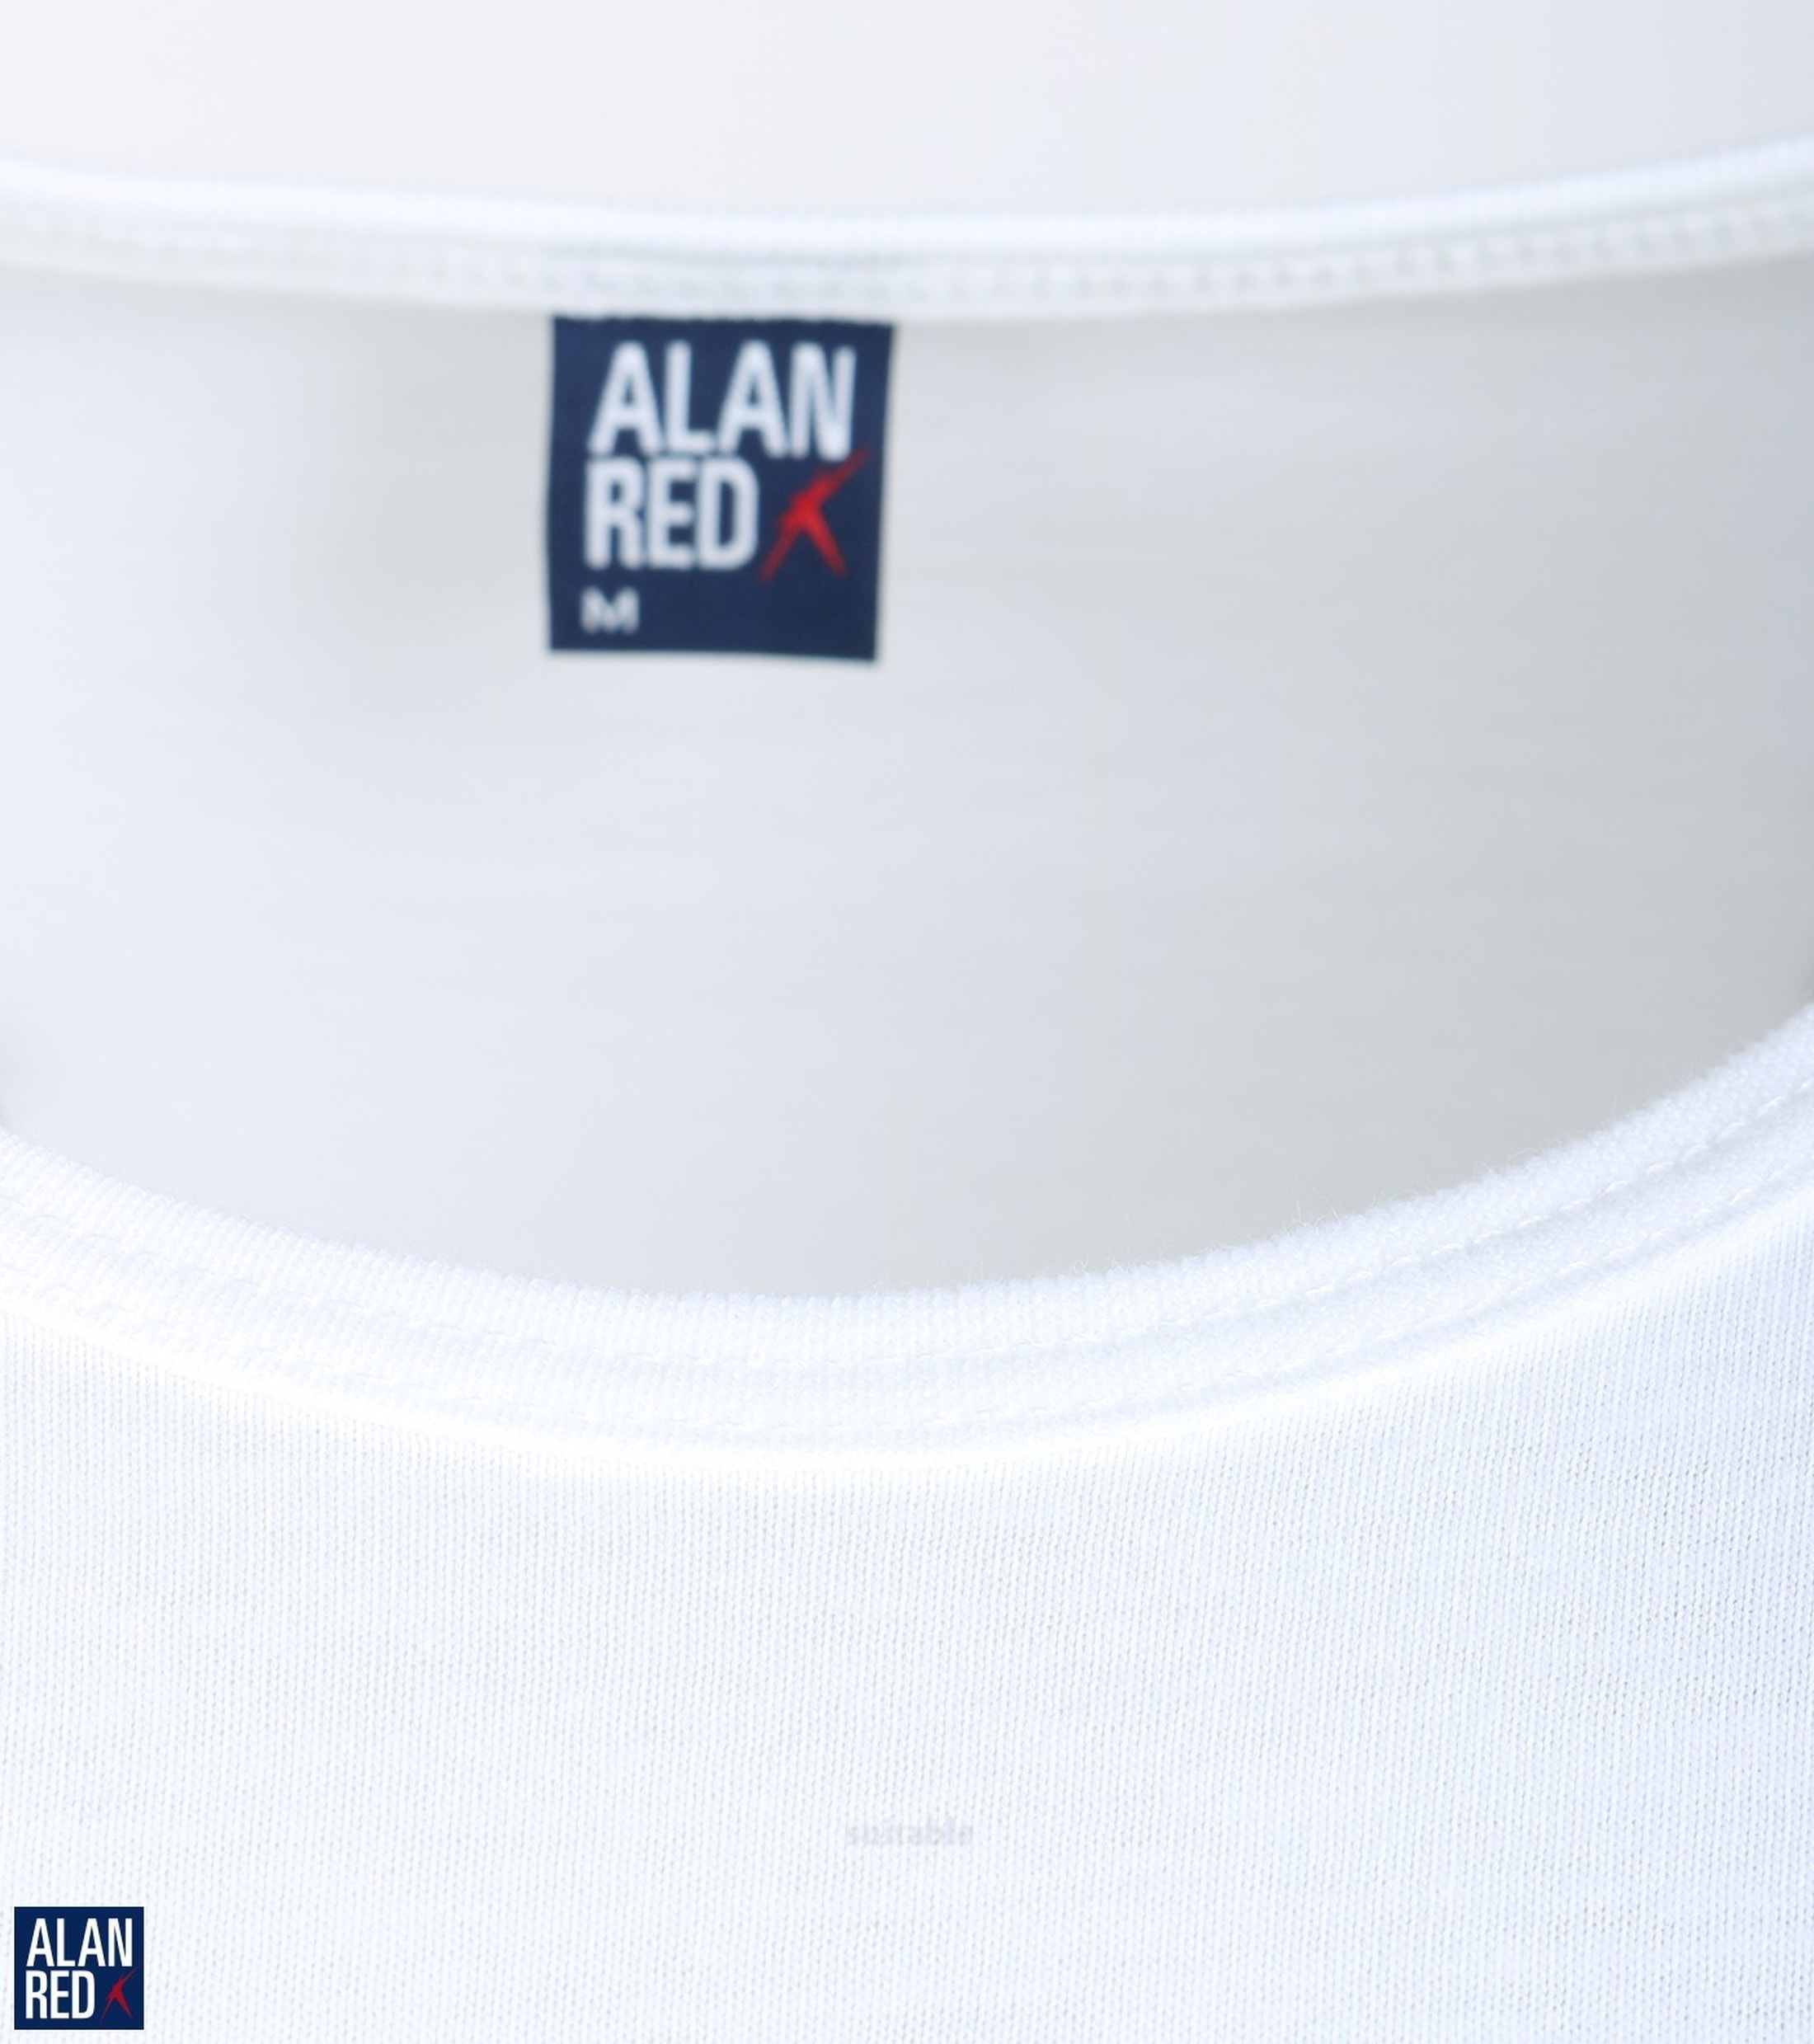 Alan Red T-Shirt Derby Weiß  (2er-Pack) foto 1